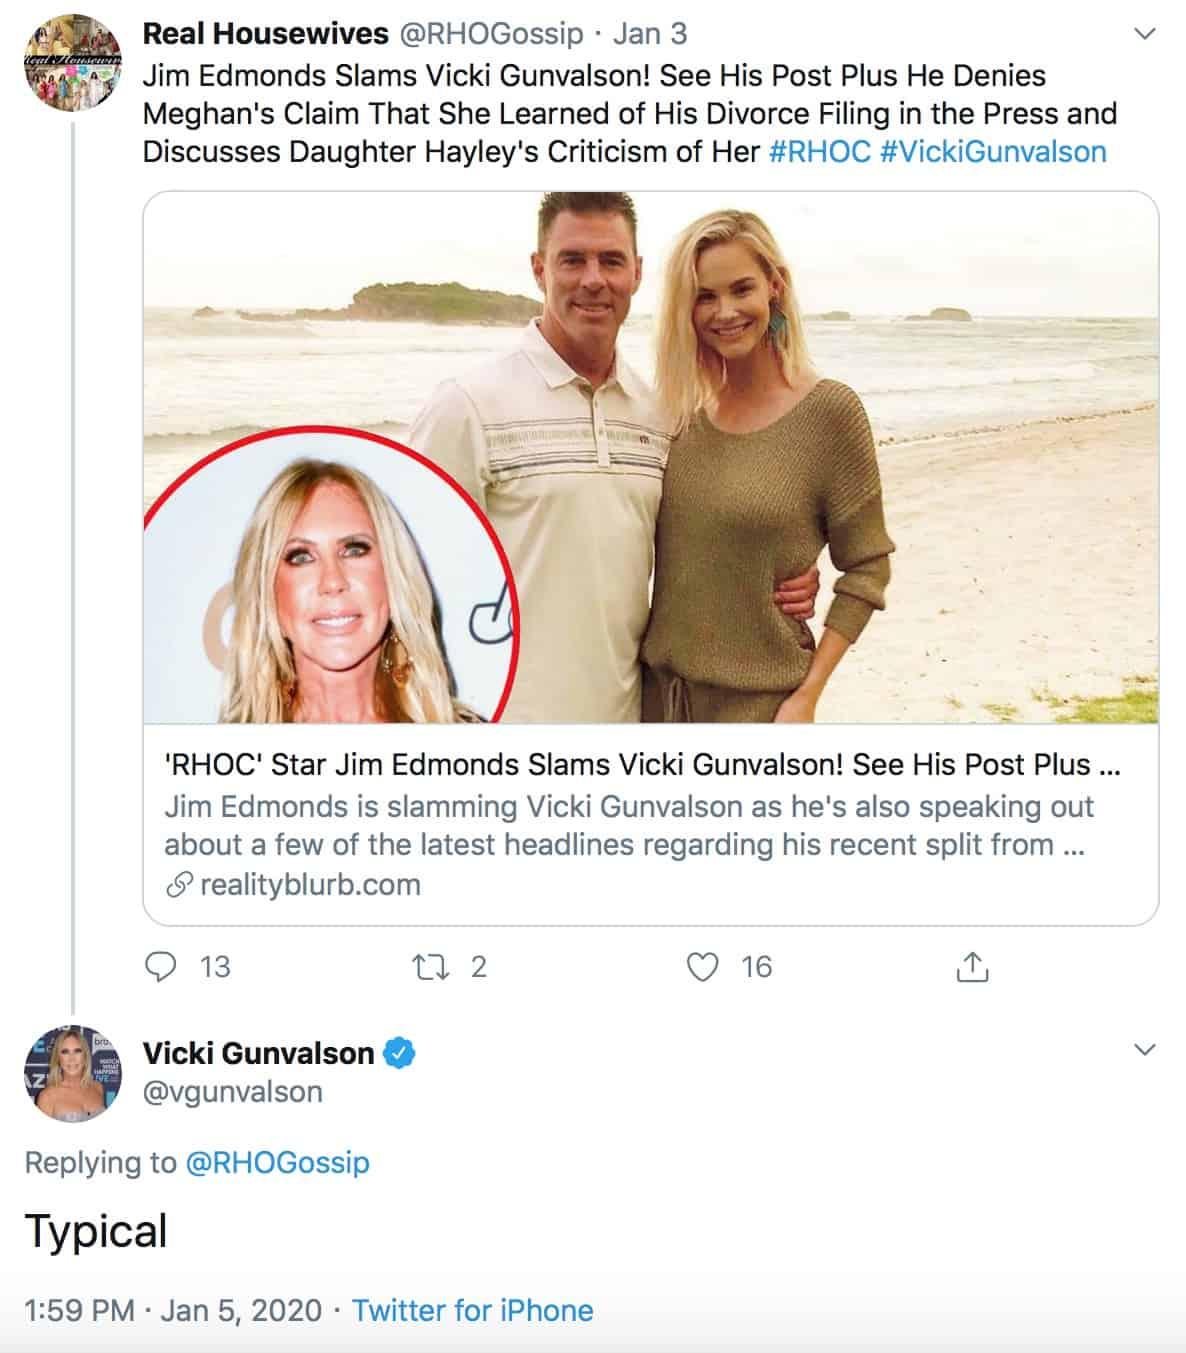 RHOC Vicki Gunvalson Responds to Jim Edmonds Saying She Sucks